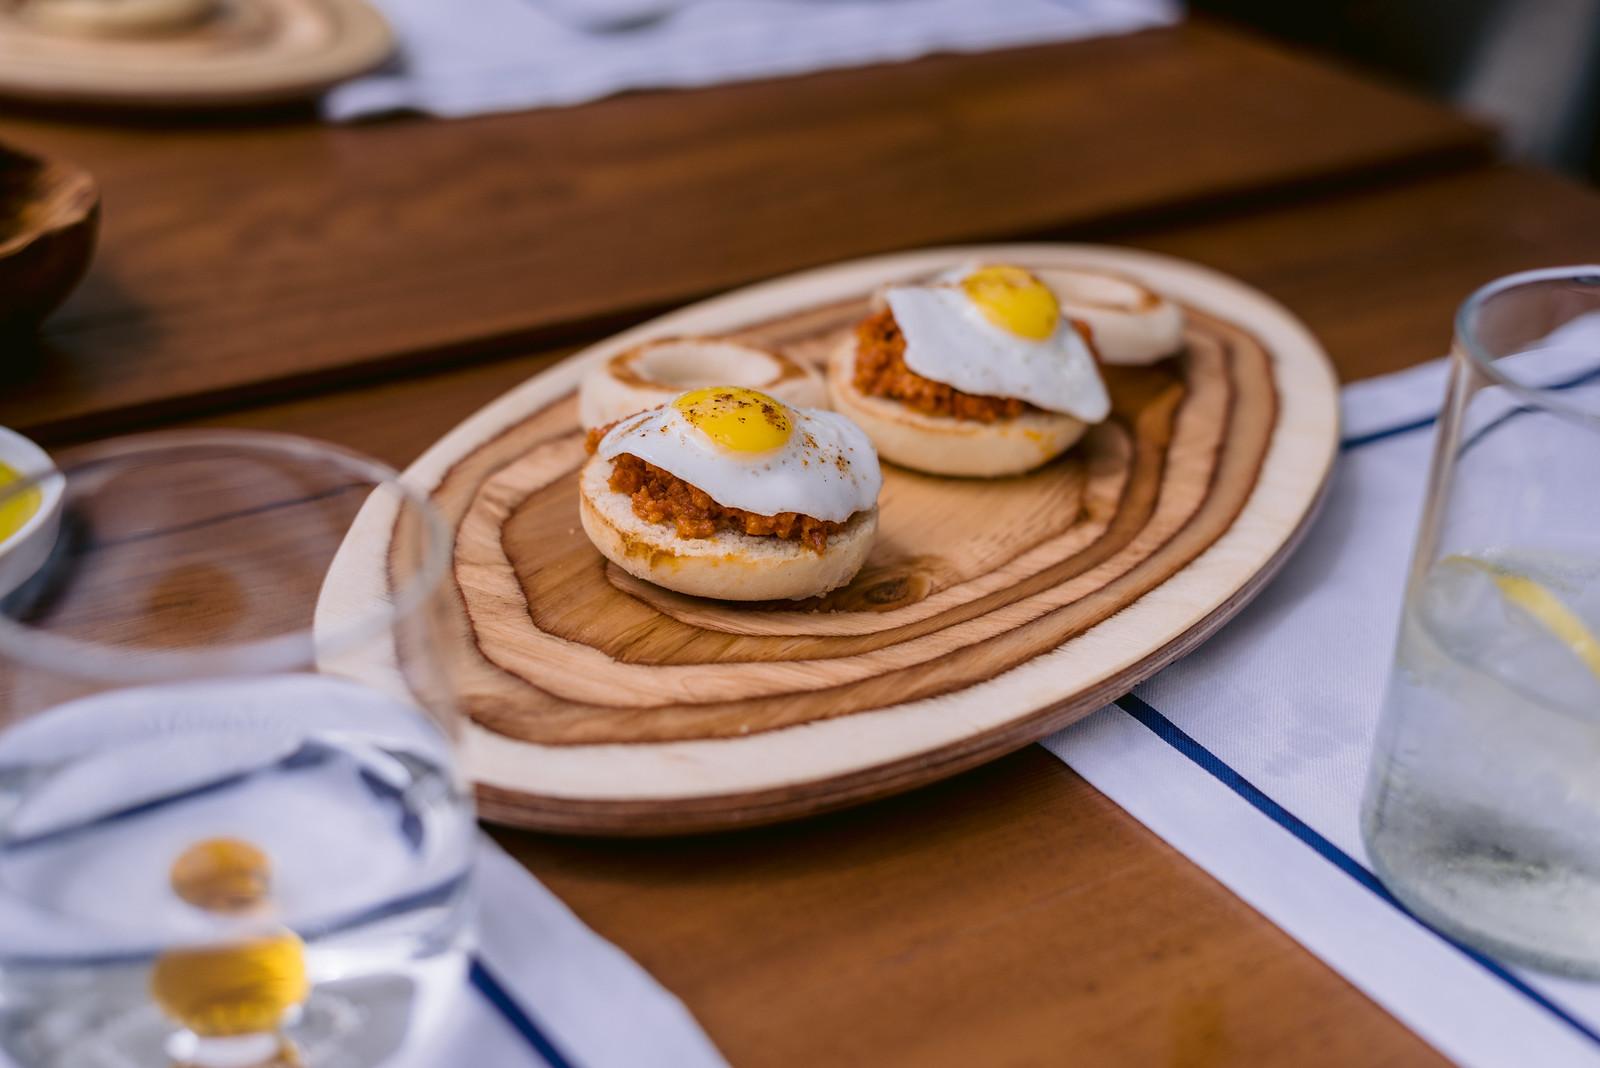 https://www.white-ibiza.com/wp-content/uploads/2021/06/white-ibiza-restaurants-bibo-ibiza-bay-10.jpg